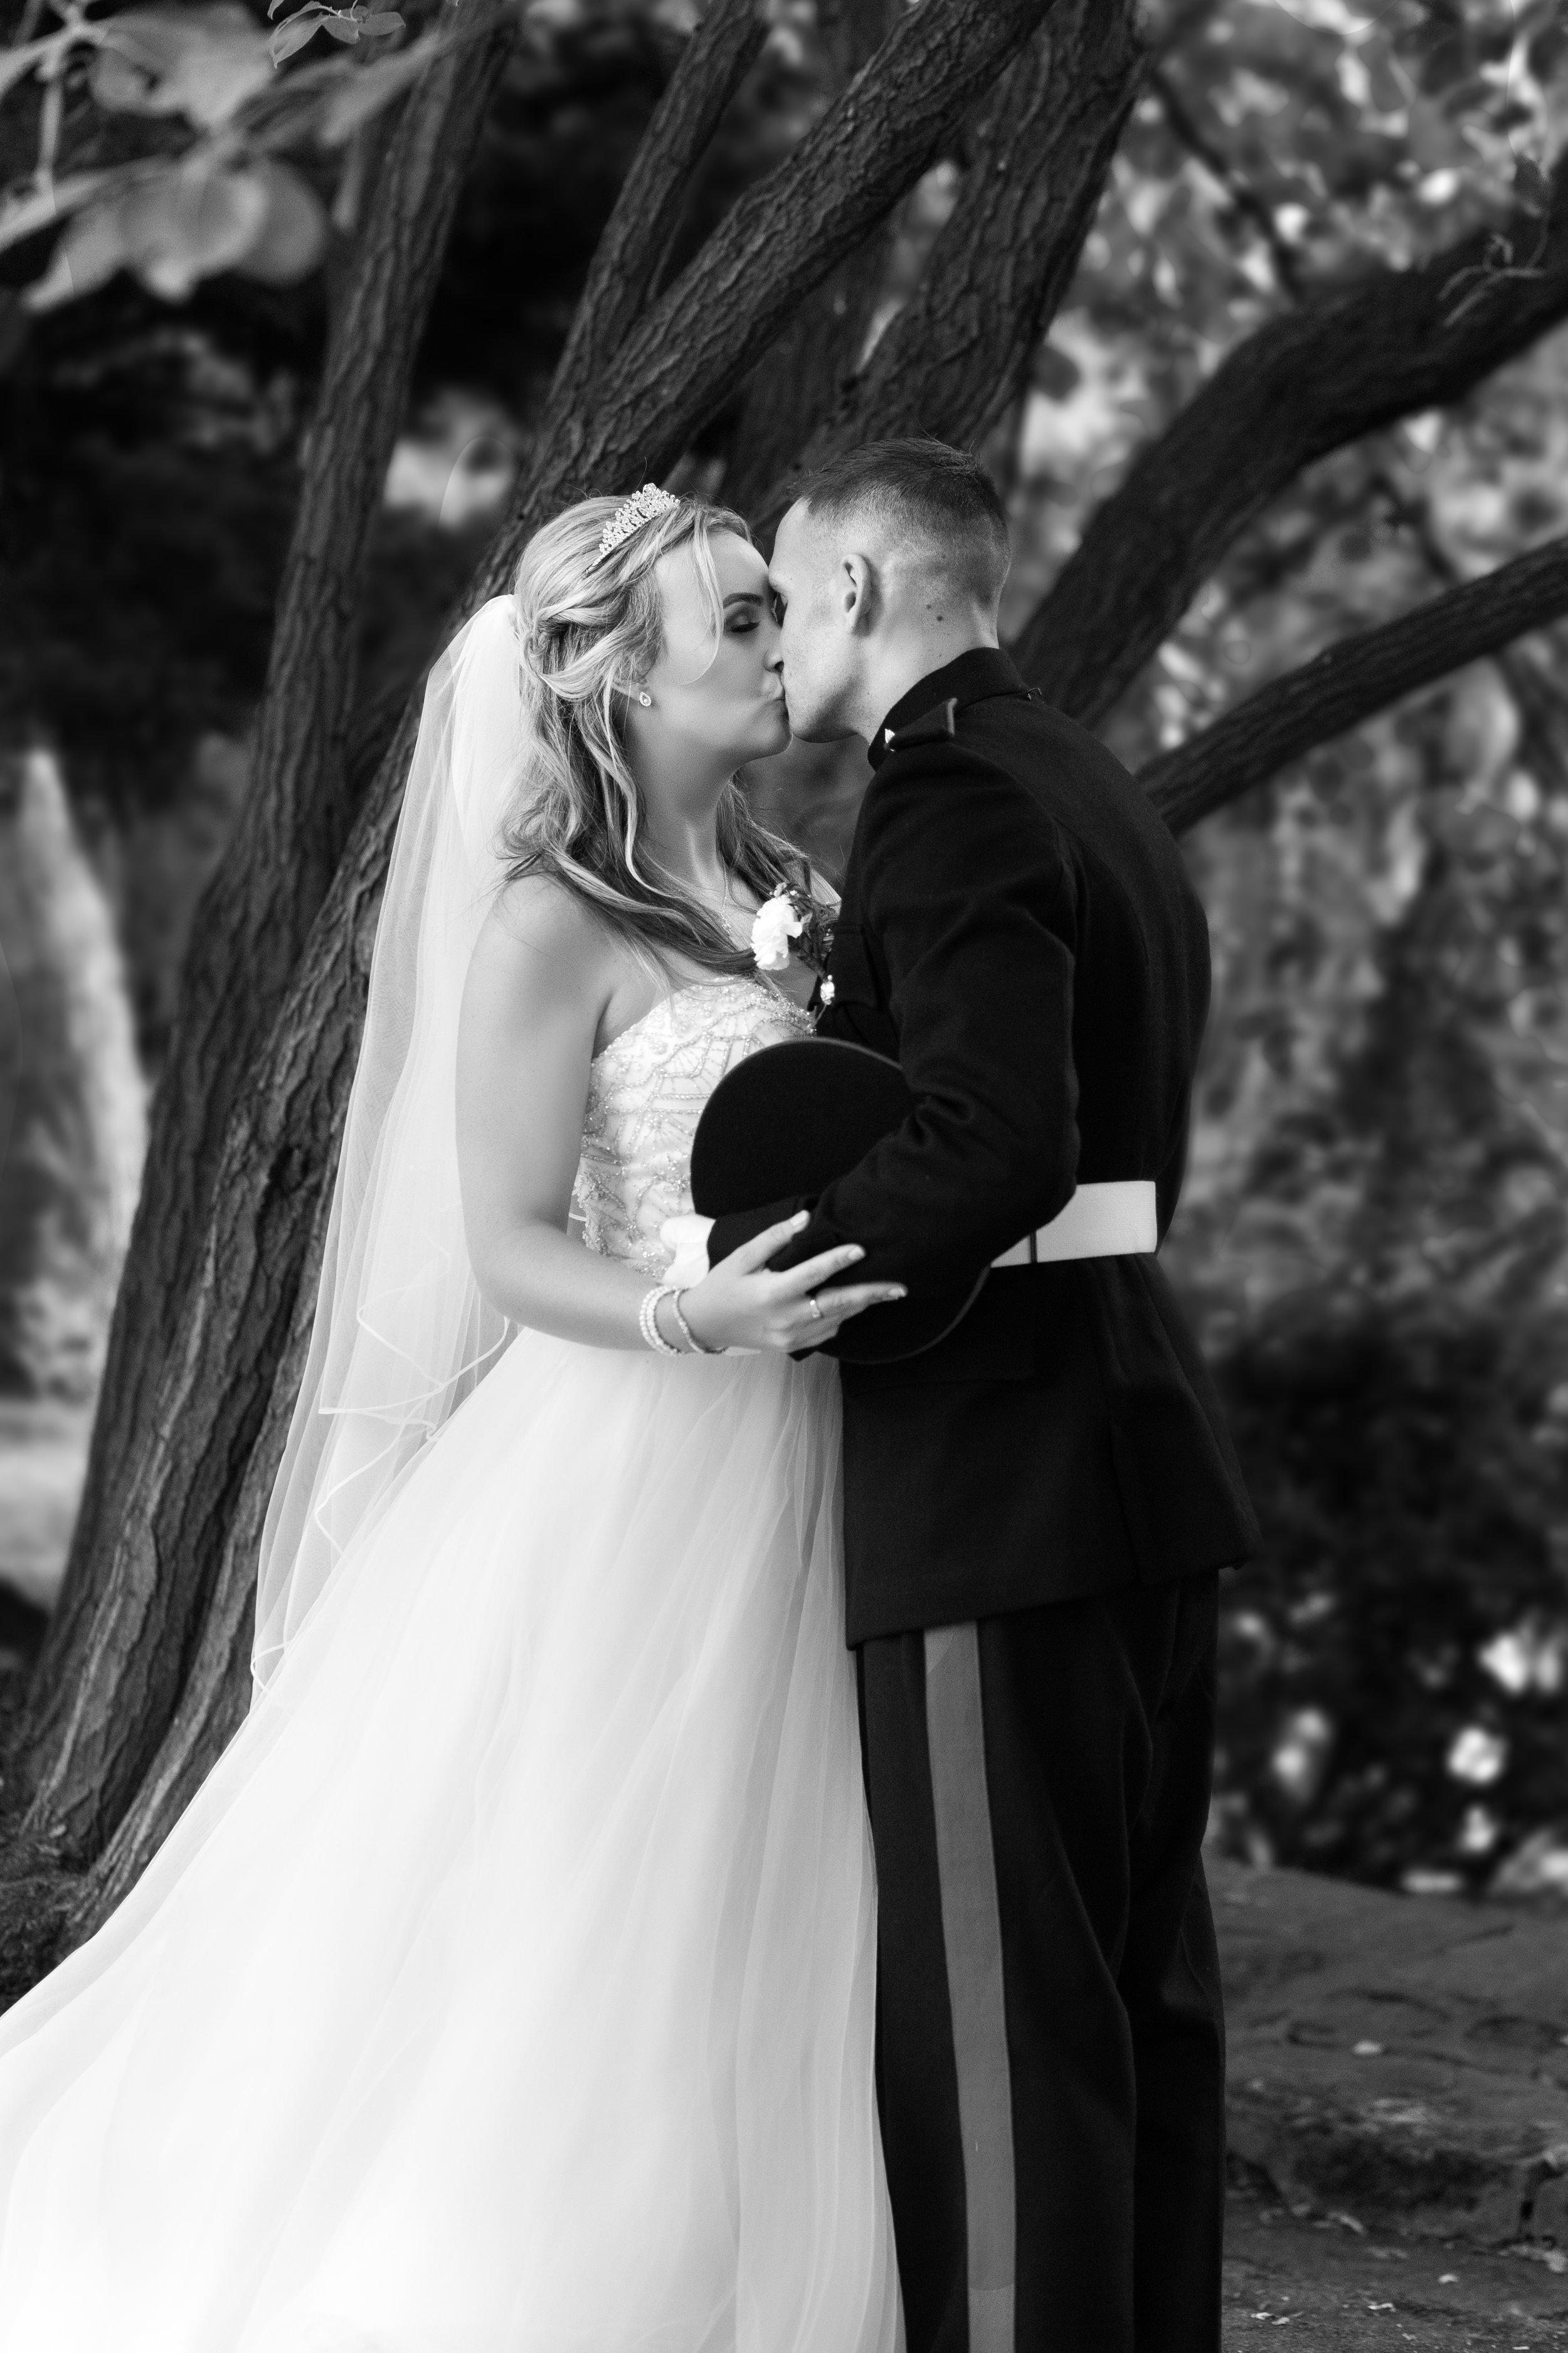 wedding-lea-cooper-photography-willenhall-west-midlands-wolverhampton-dudley-birmingham-uk-marriage-hadley-park-east-telford-couple-kiss.jpg